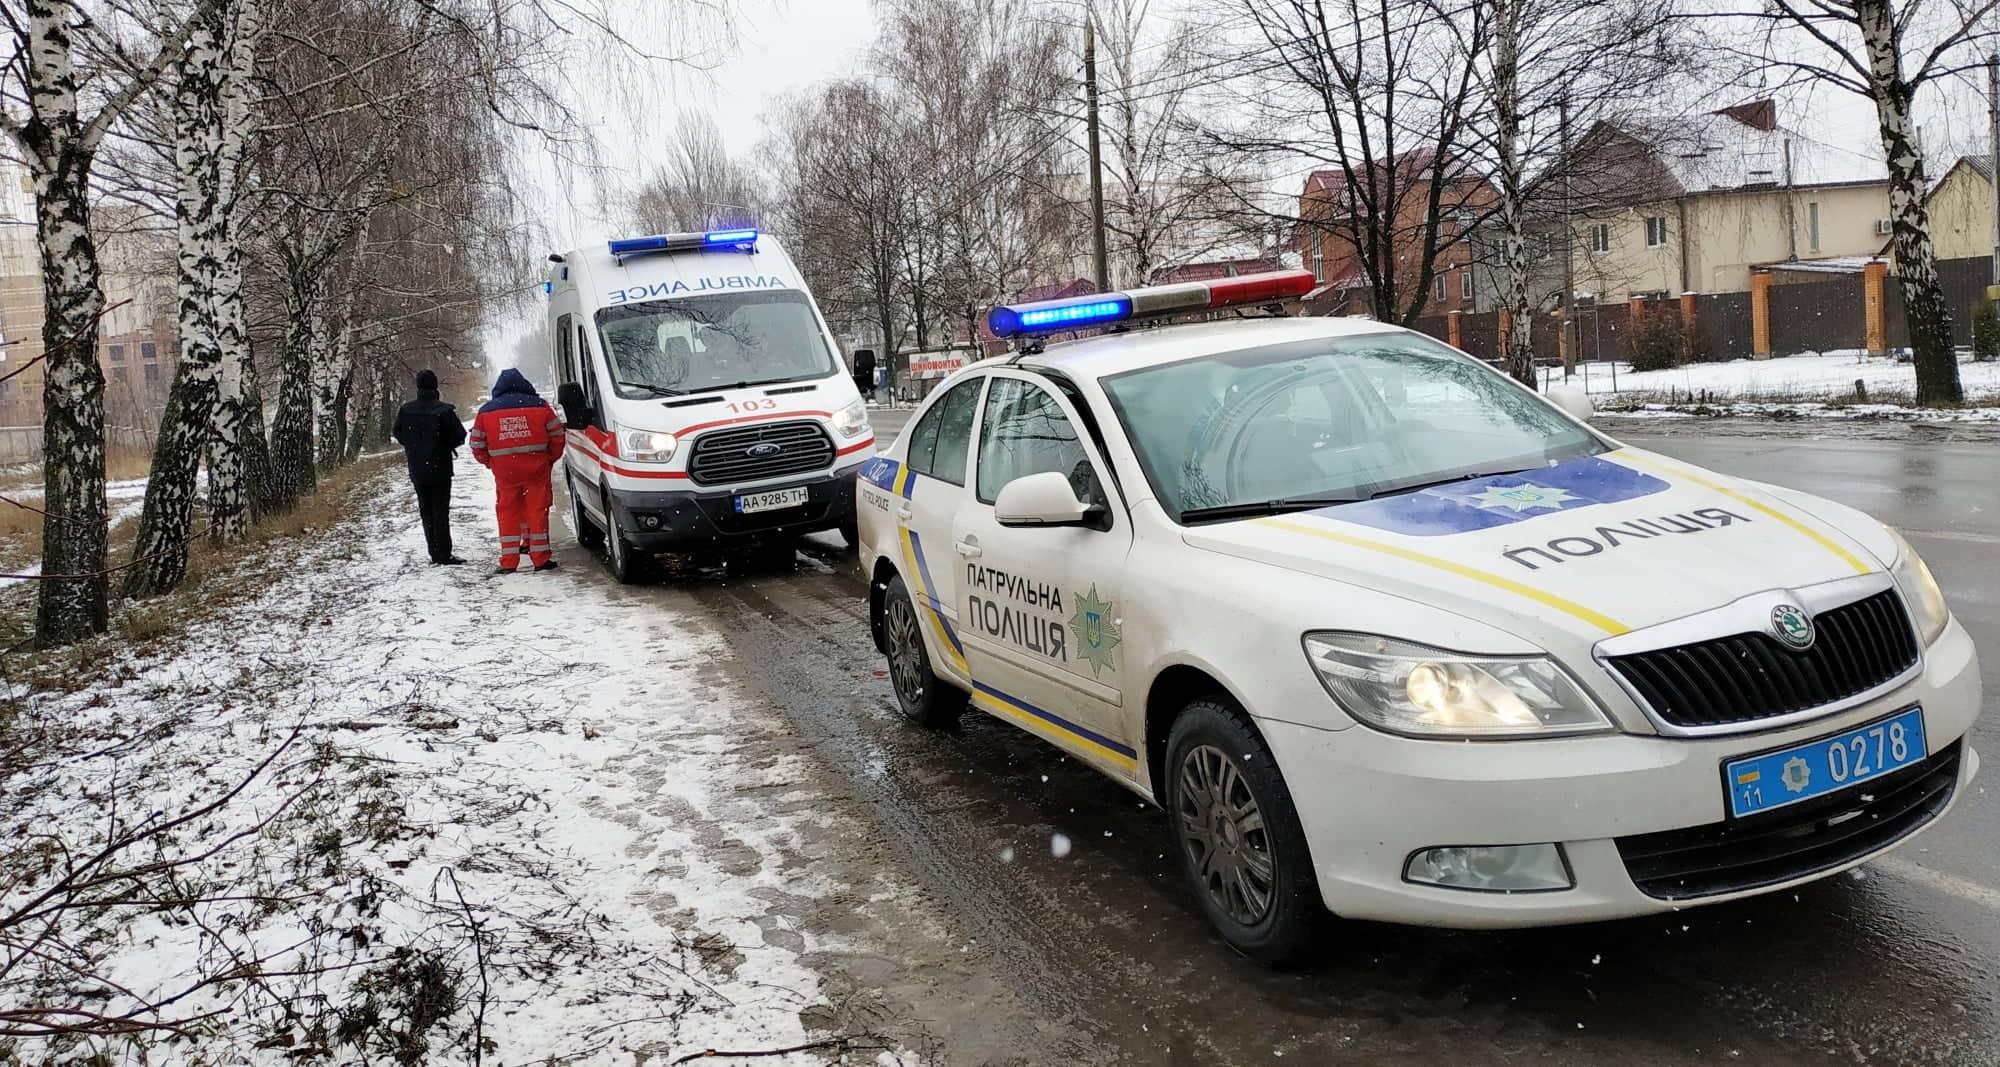 0213_pat_shvtdka_na-dorozi «Увага! Спецсигнал»: як забезпечити пріоритет спецтранспорту на дорозі